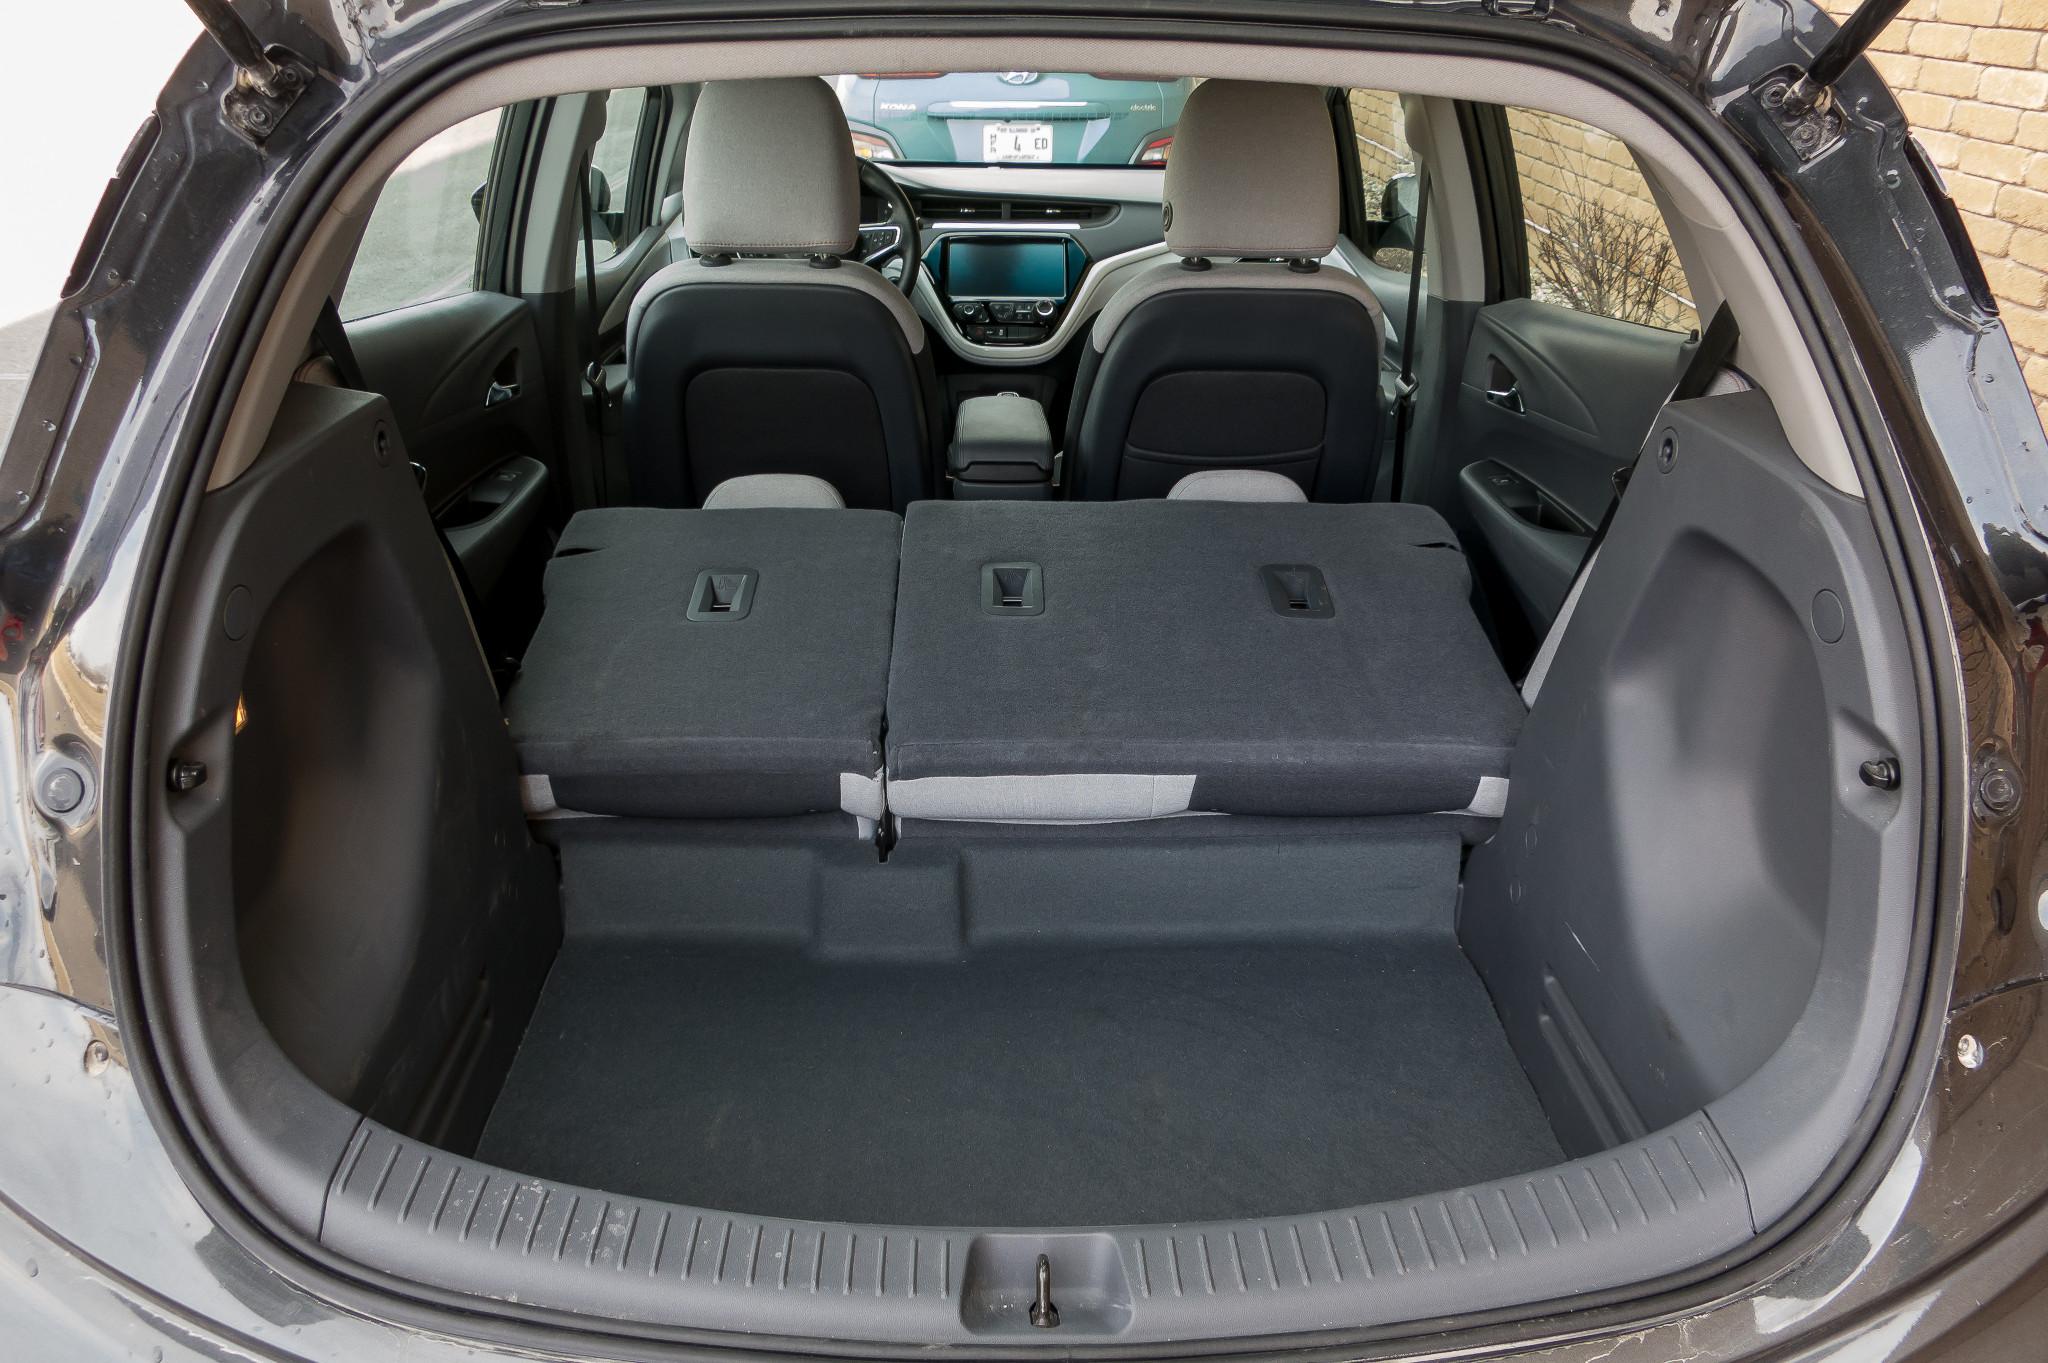 Hyundai Kona Electric Vs. Chevrolet Bolt EV: Which Is the ...